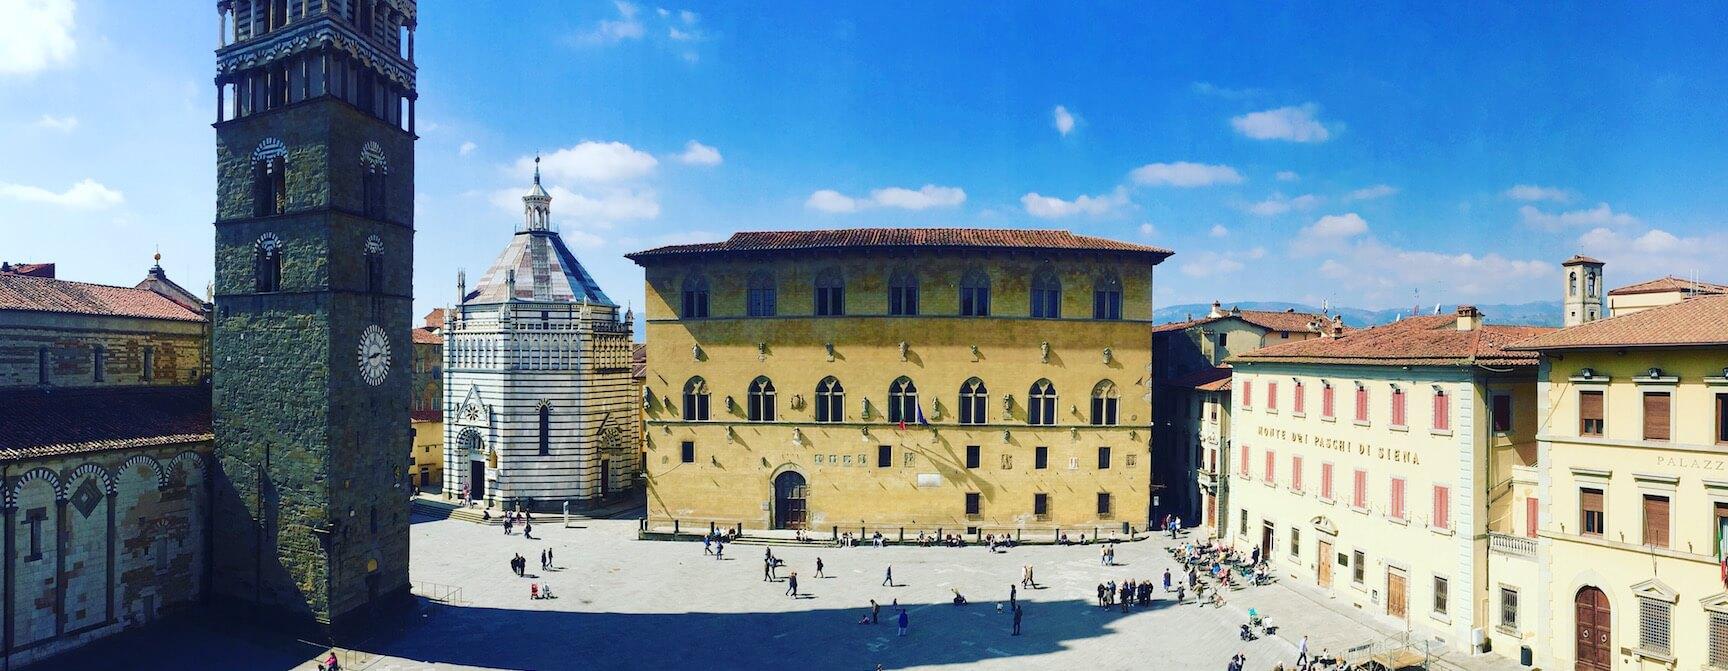 Pistoia square Tuscany